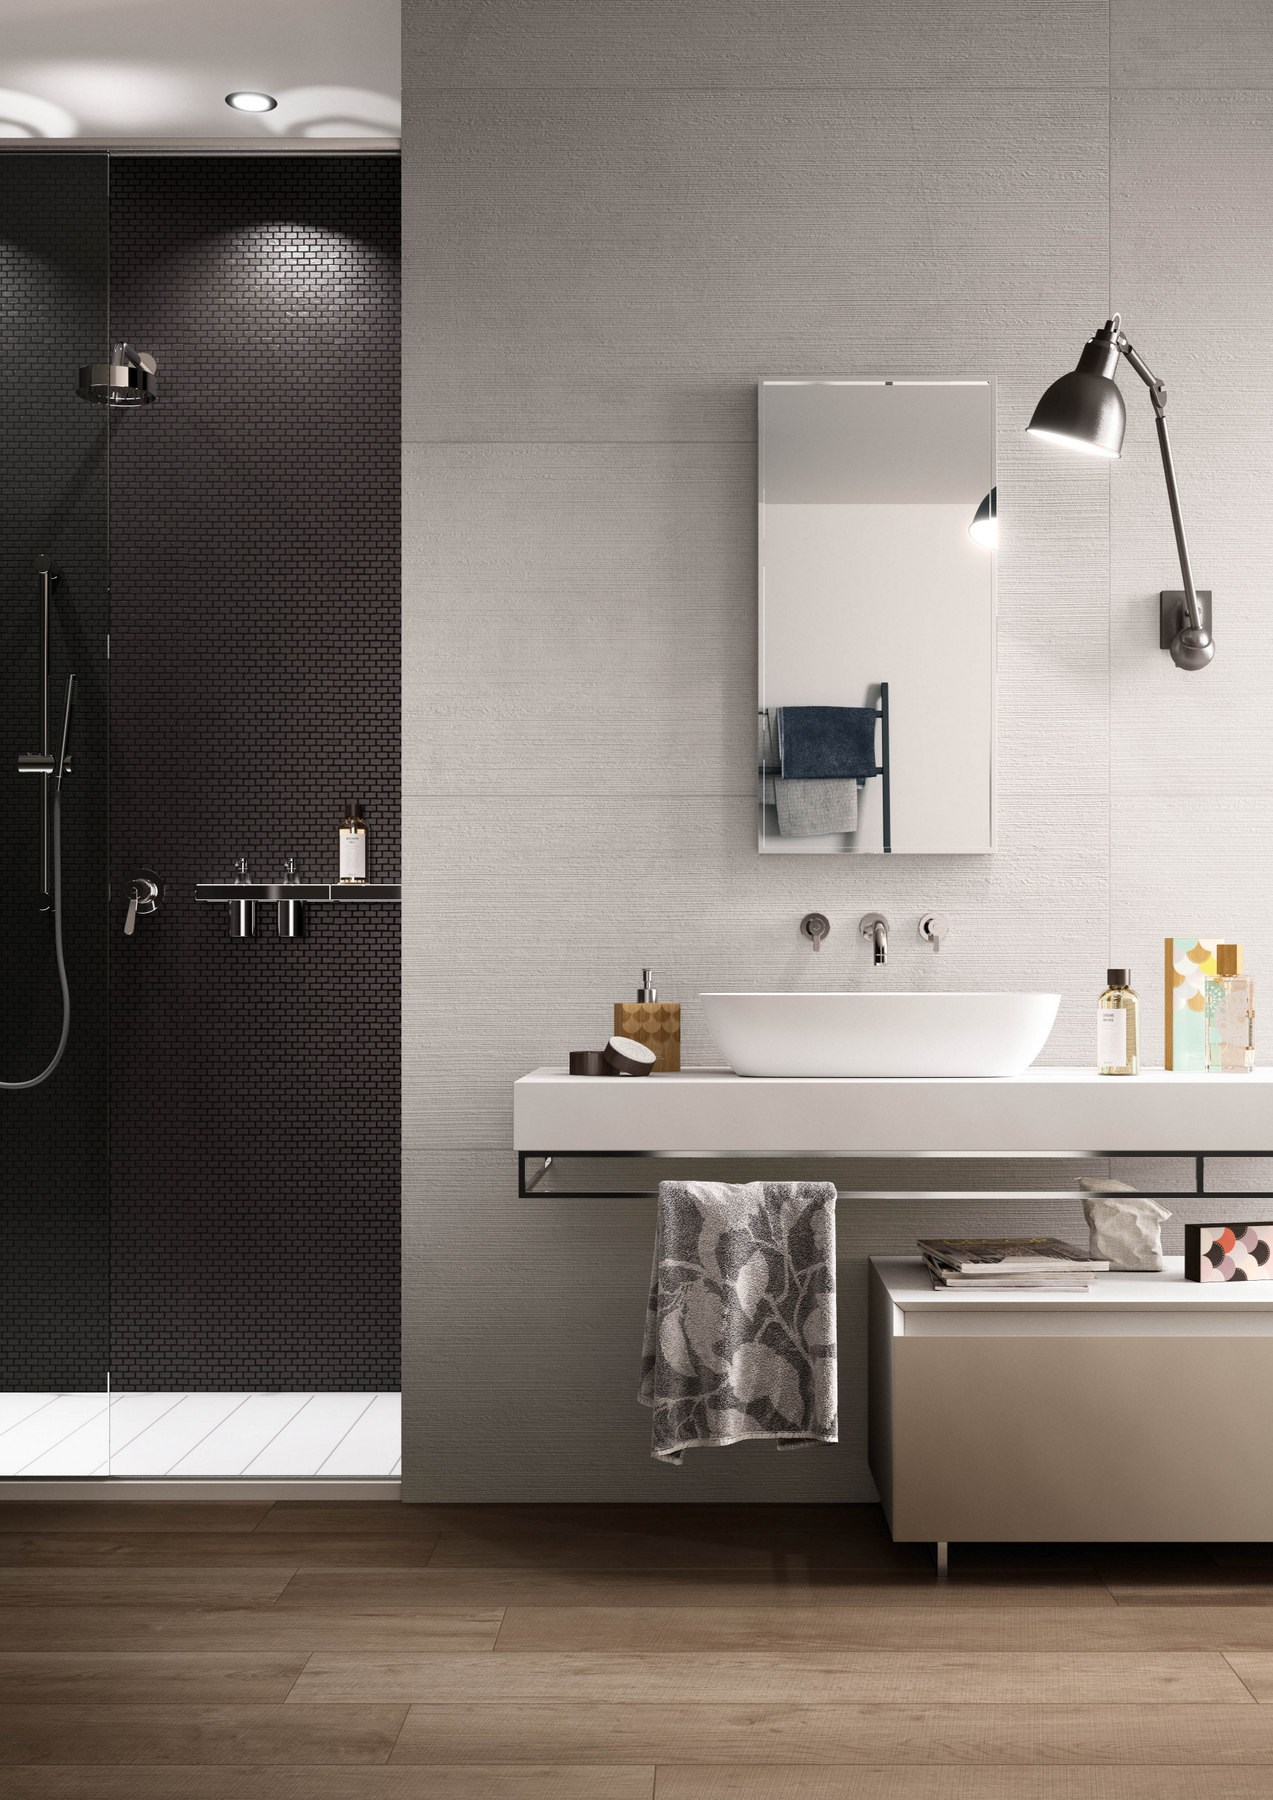 carrelage porto venere environnement design. Black Bedroom Furniture Sets. Home Design Ideas